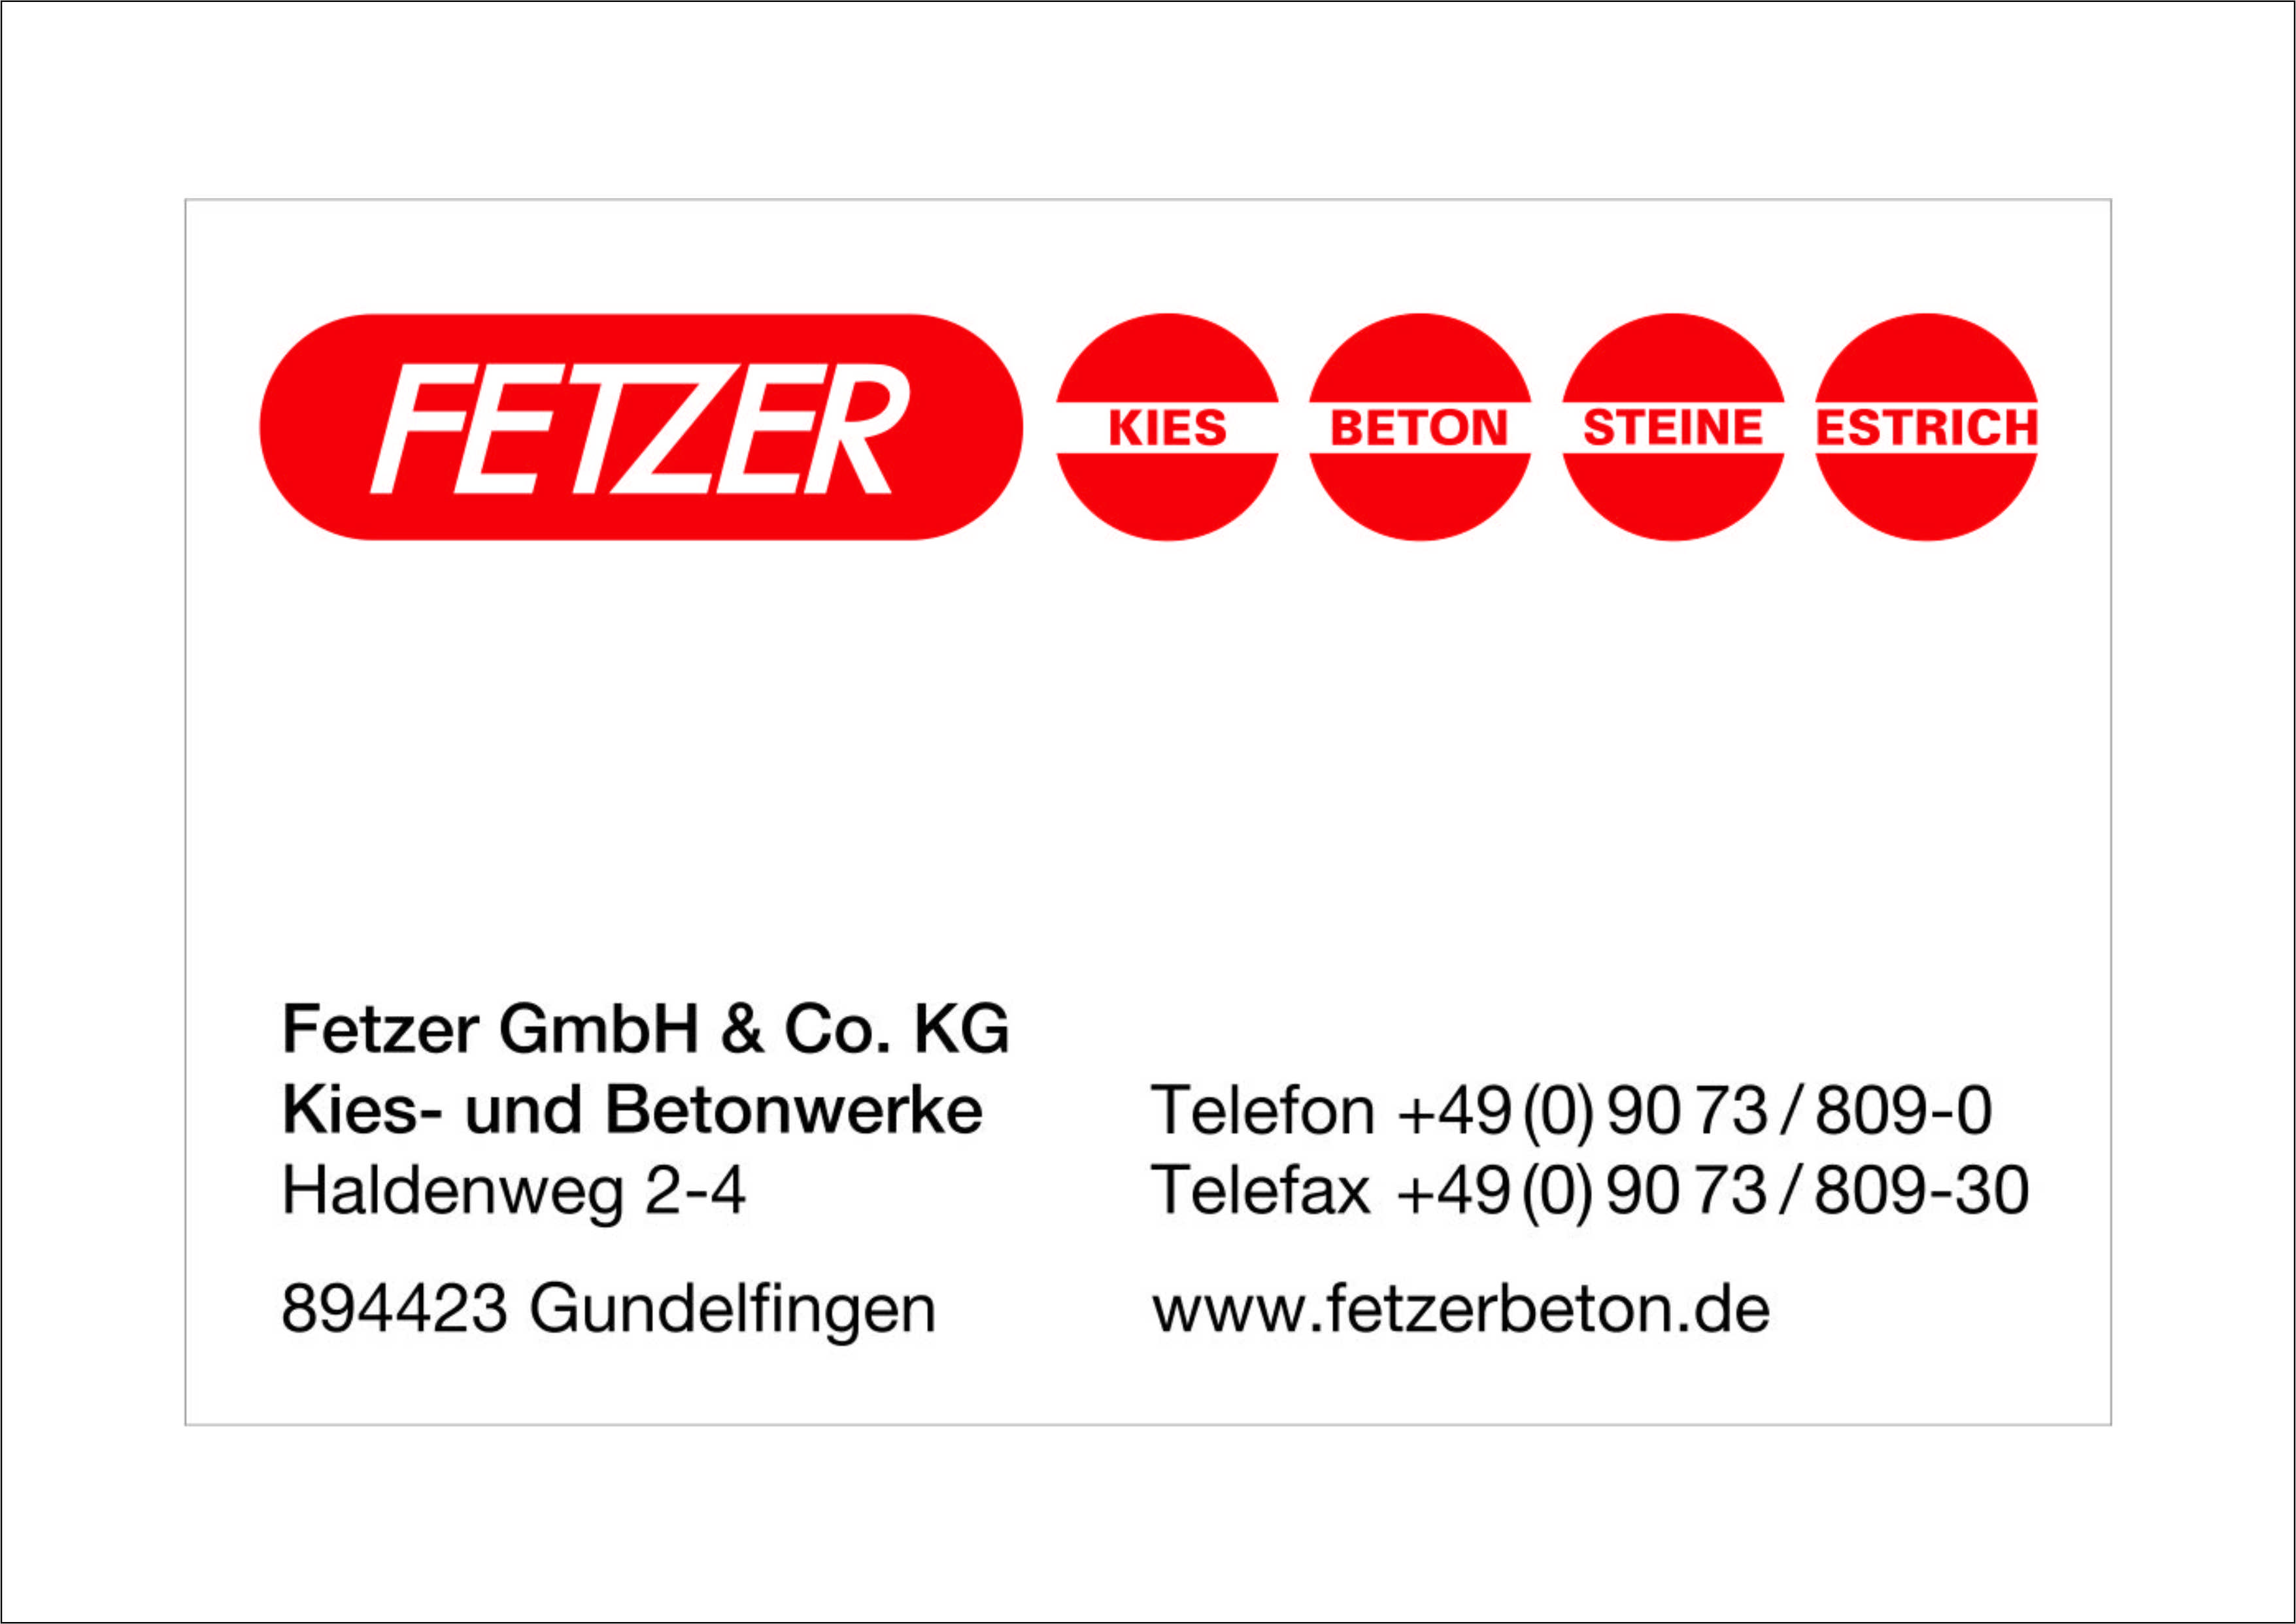 Fetzer GmbH & Co. KG